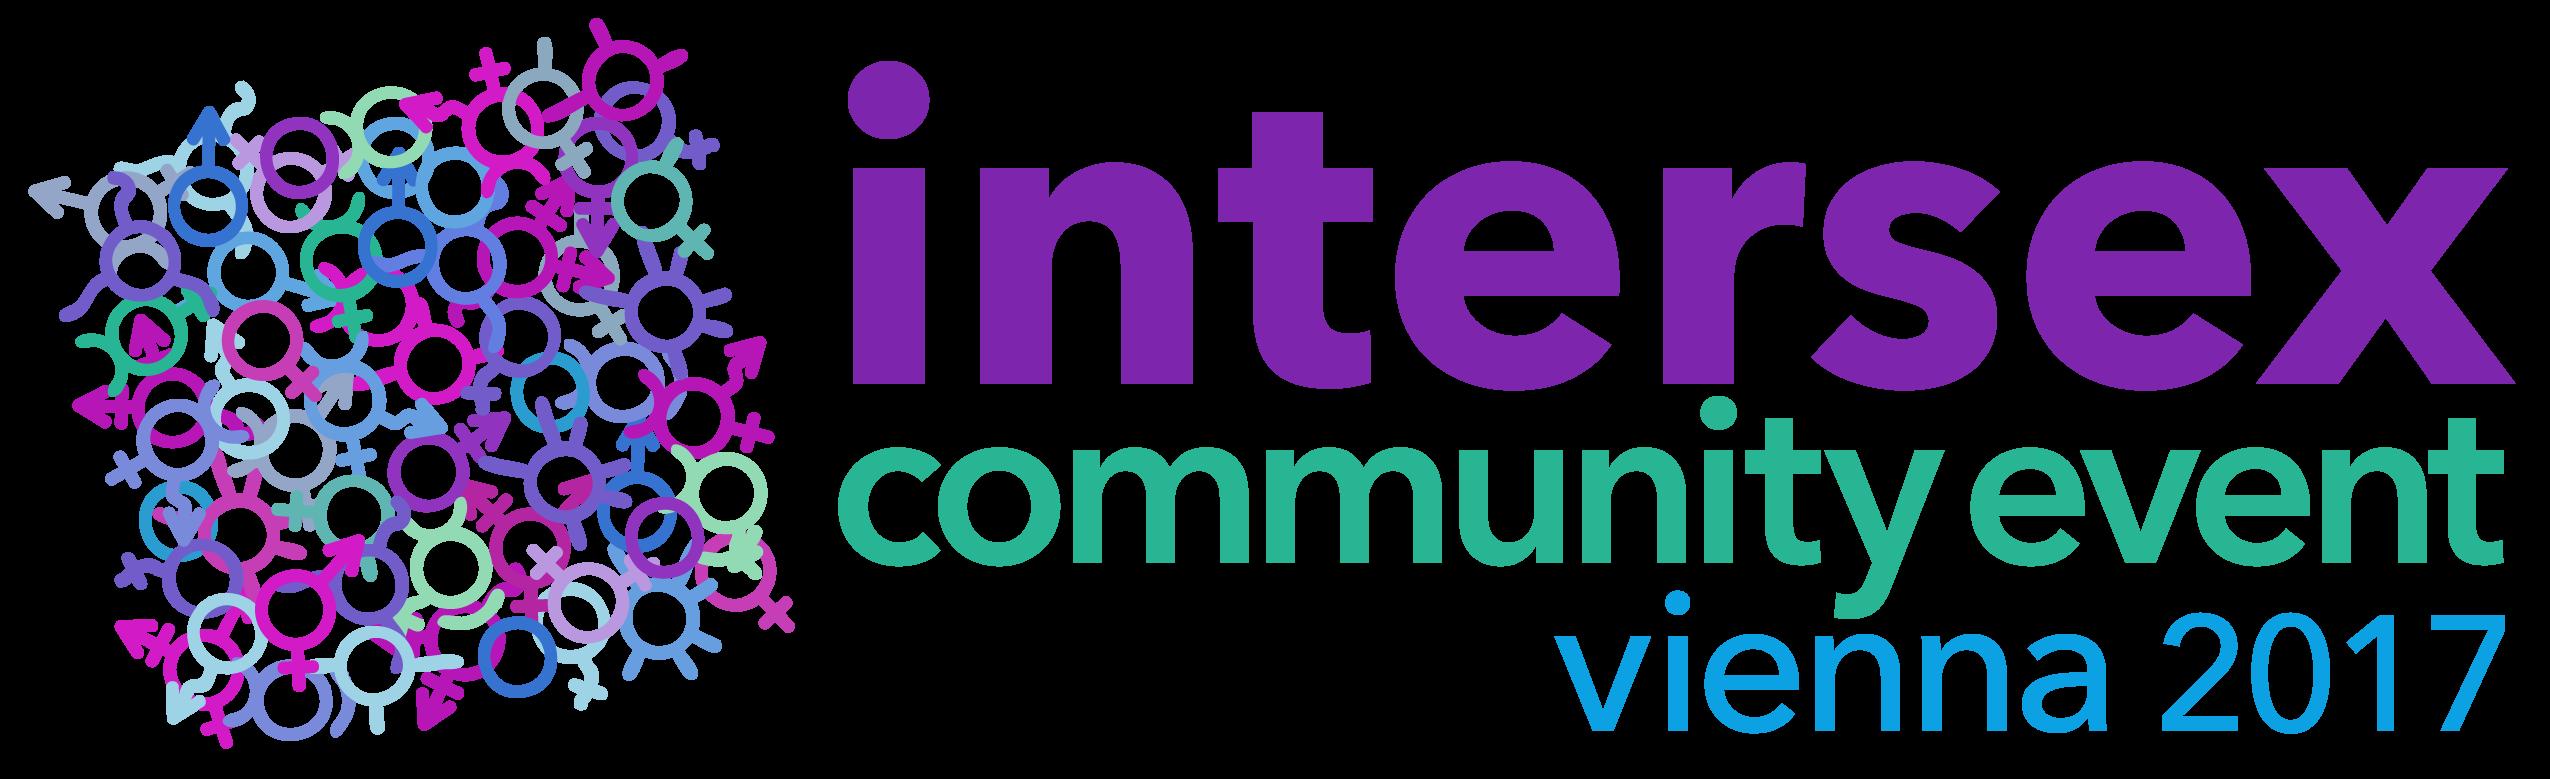 Our first European Intersex Community Event in Vienna 2017!